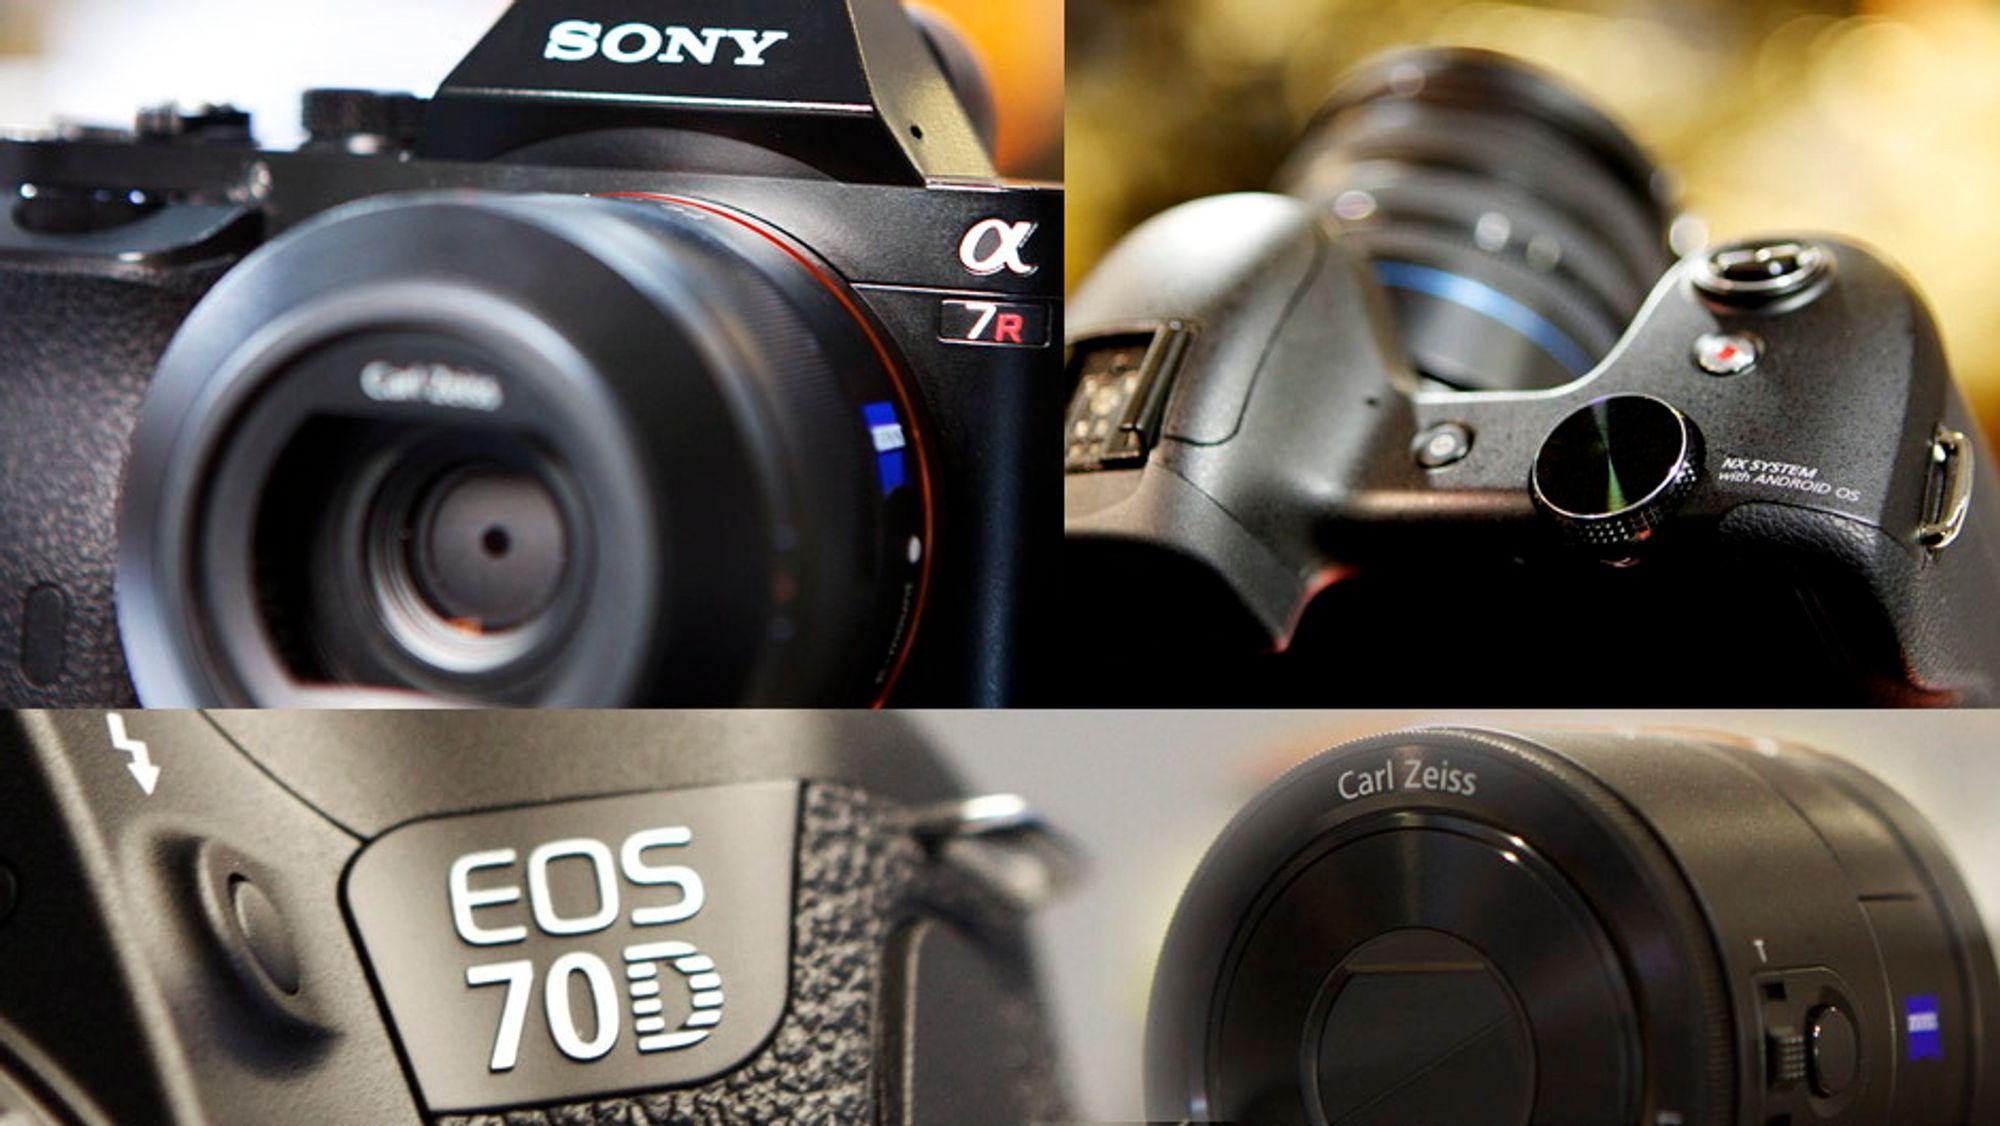 Innovasjoner: Sony A7 r, Samsung Galaxy NX, Canon EOS 70D og Sony QX-100. Foto: Eirik Helland Urke